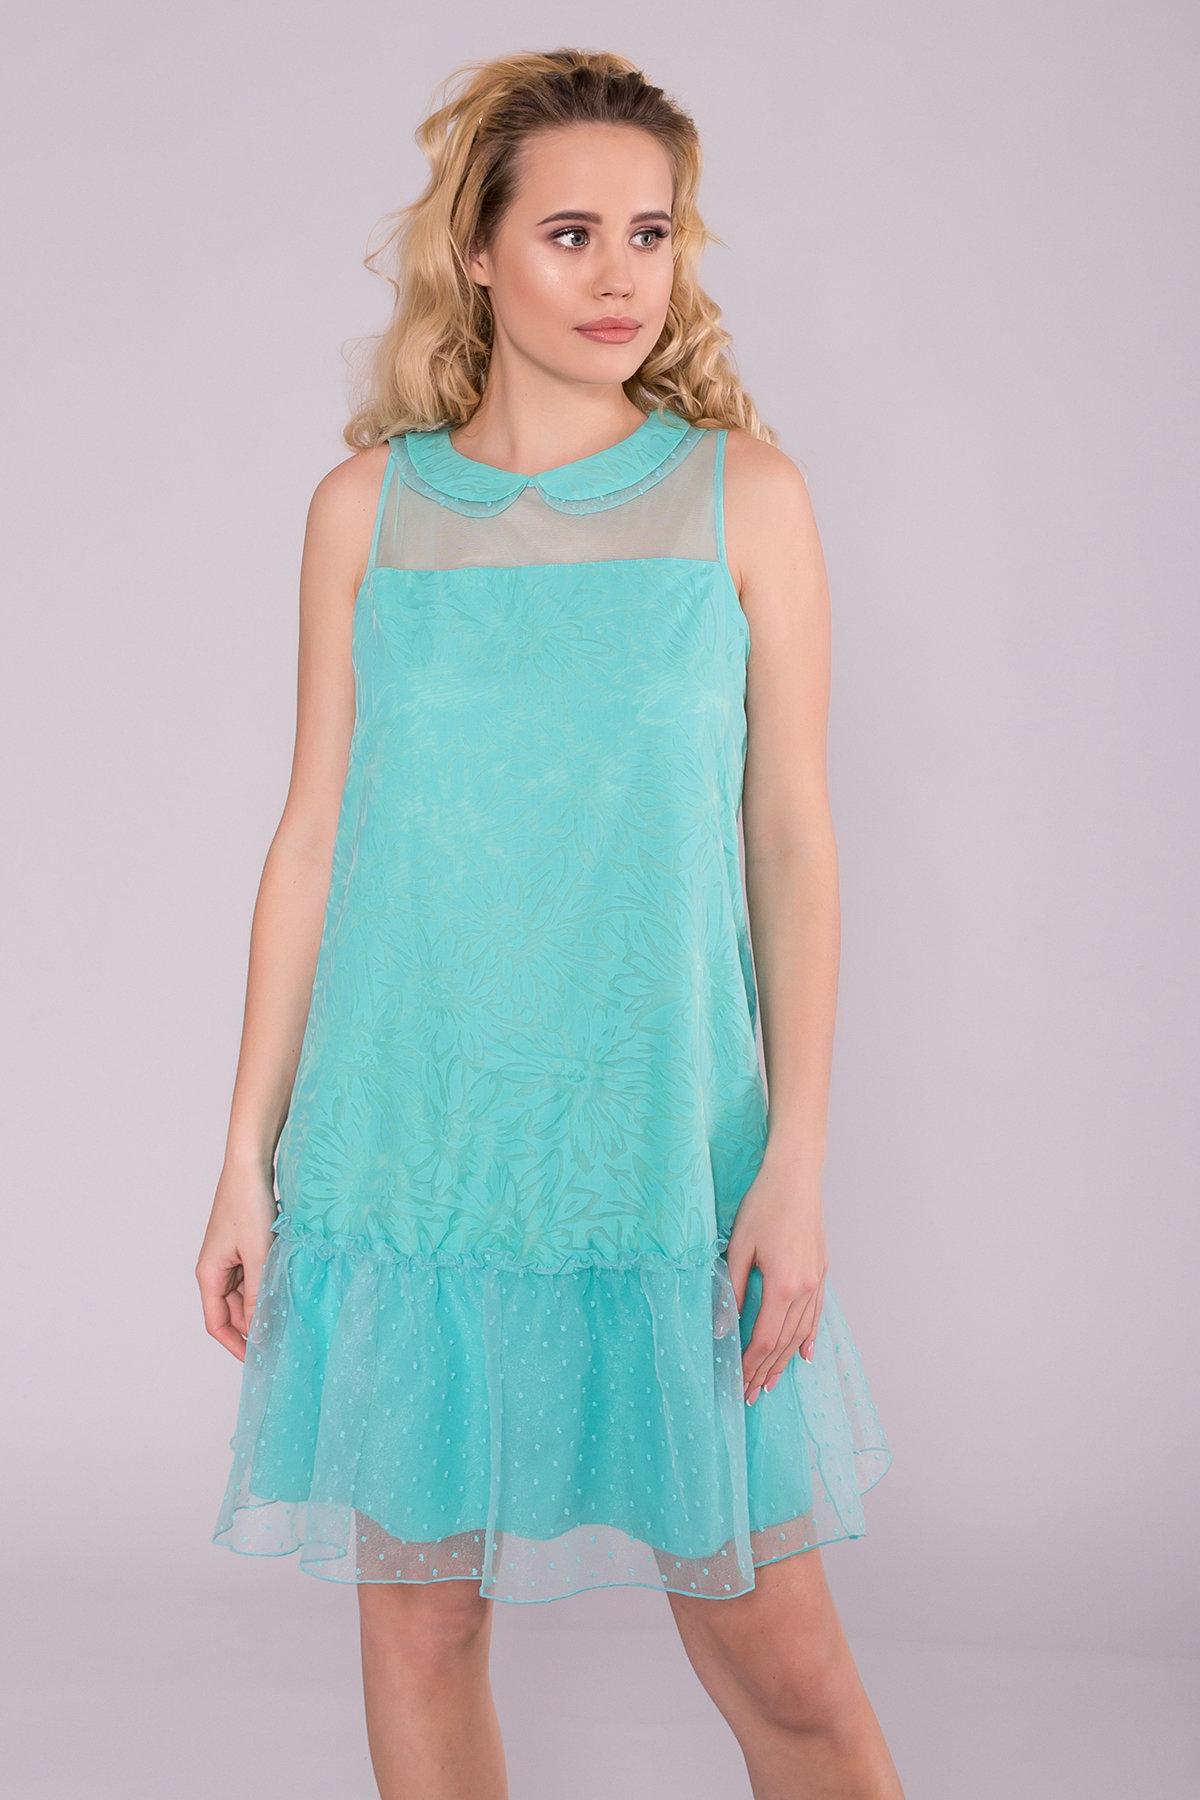 Платье Манила 6978 Цвет: Мята/мушка/мята